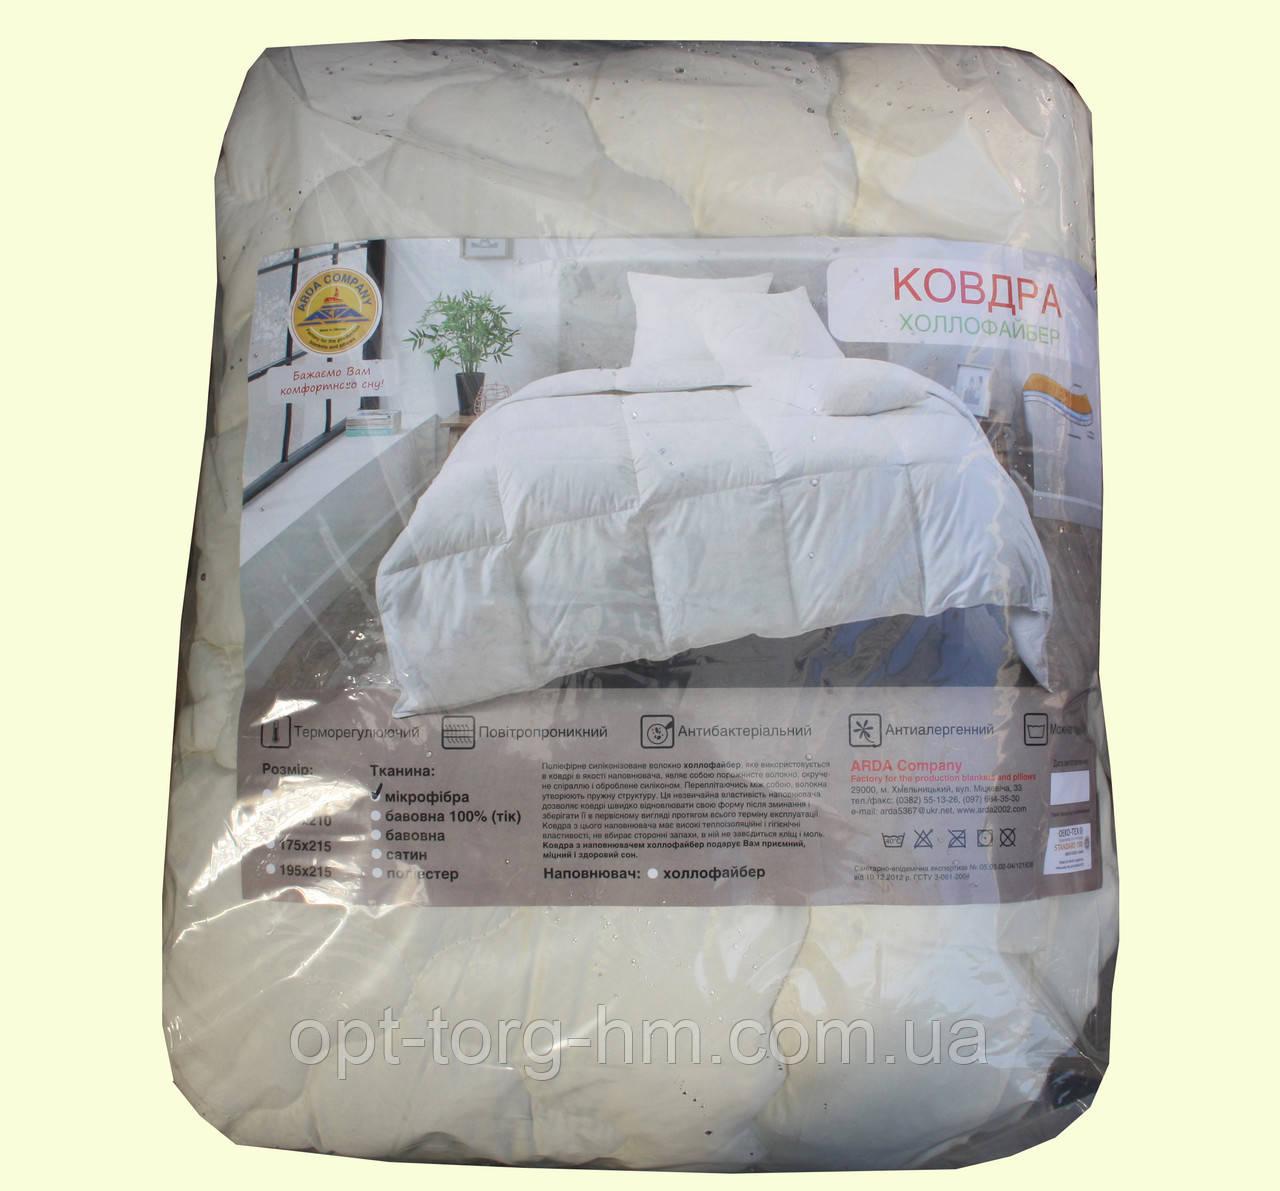 Одеяло однотонное 175*215 Холлофайбер ARDA Company